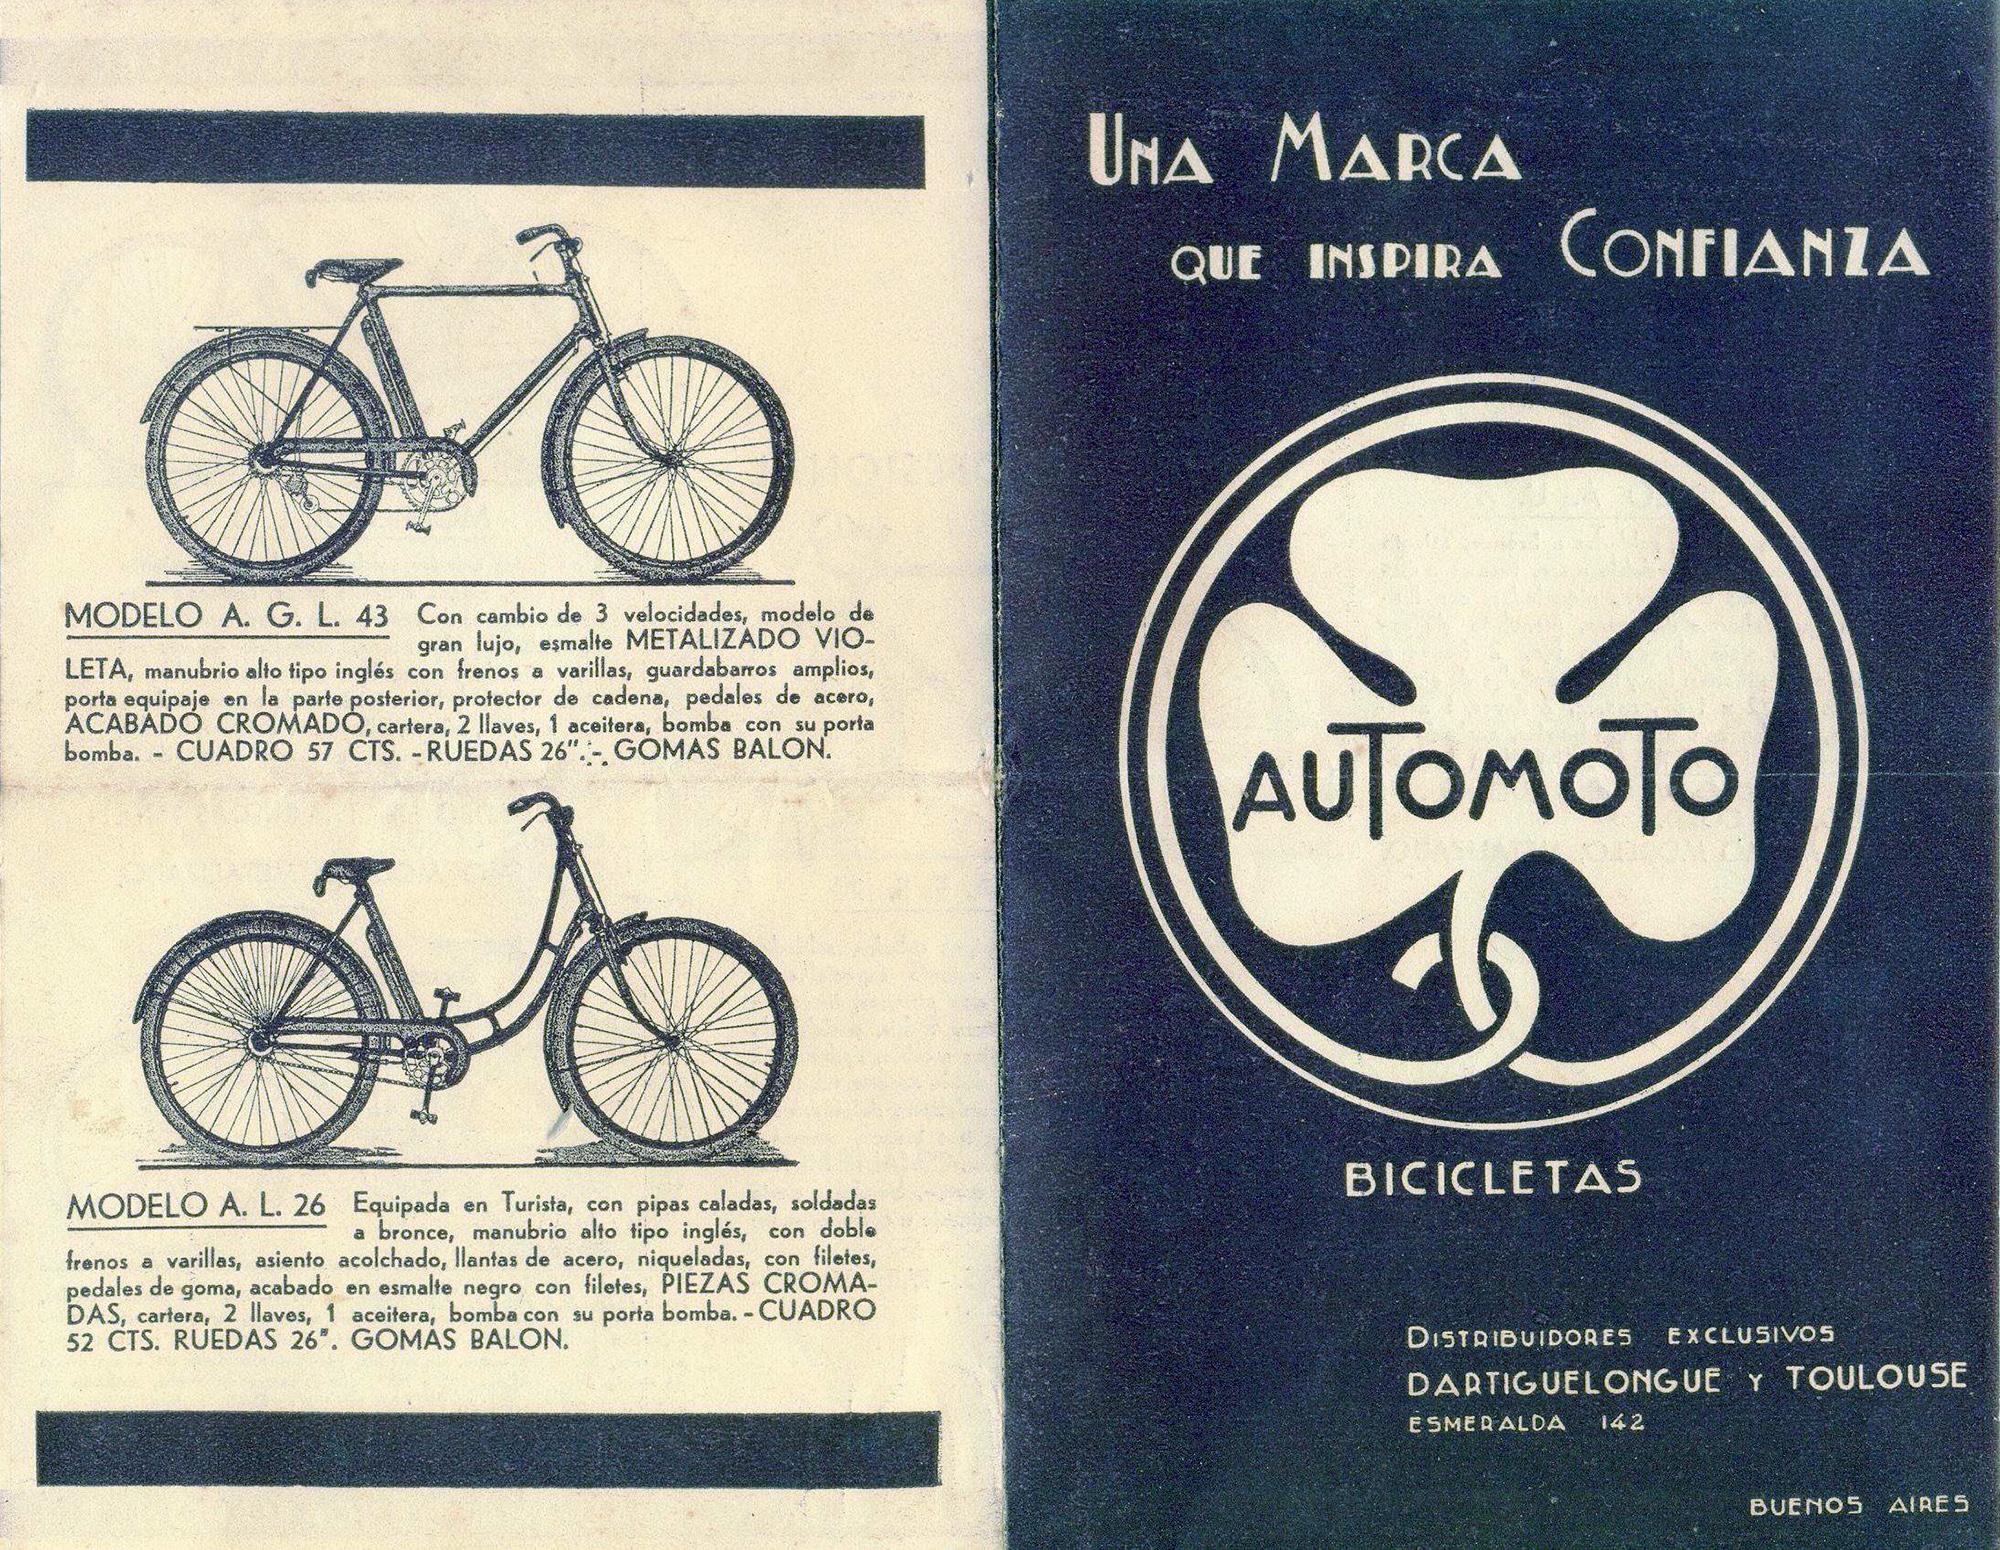 ebykr-automoto-agentina-distributor-catalog-cover-back